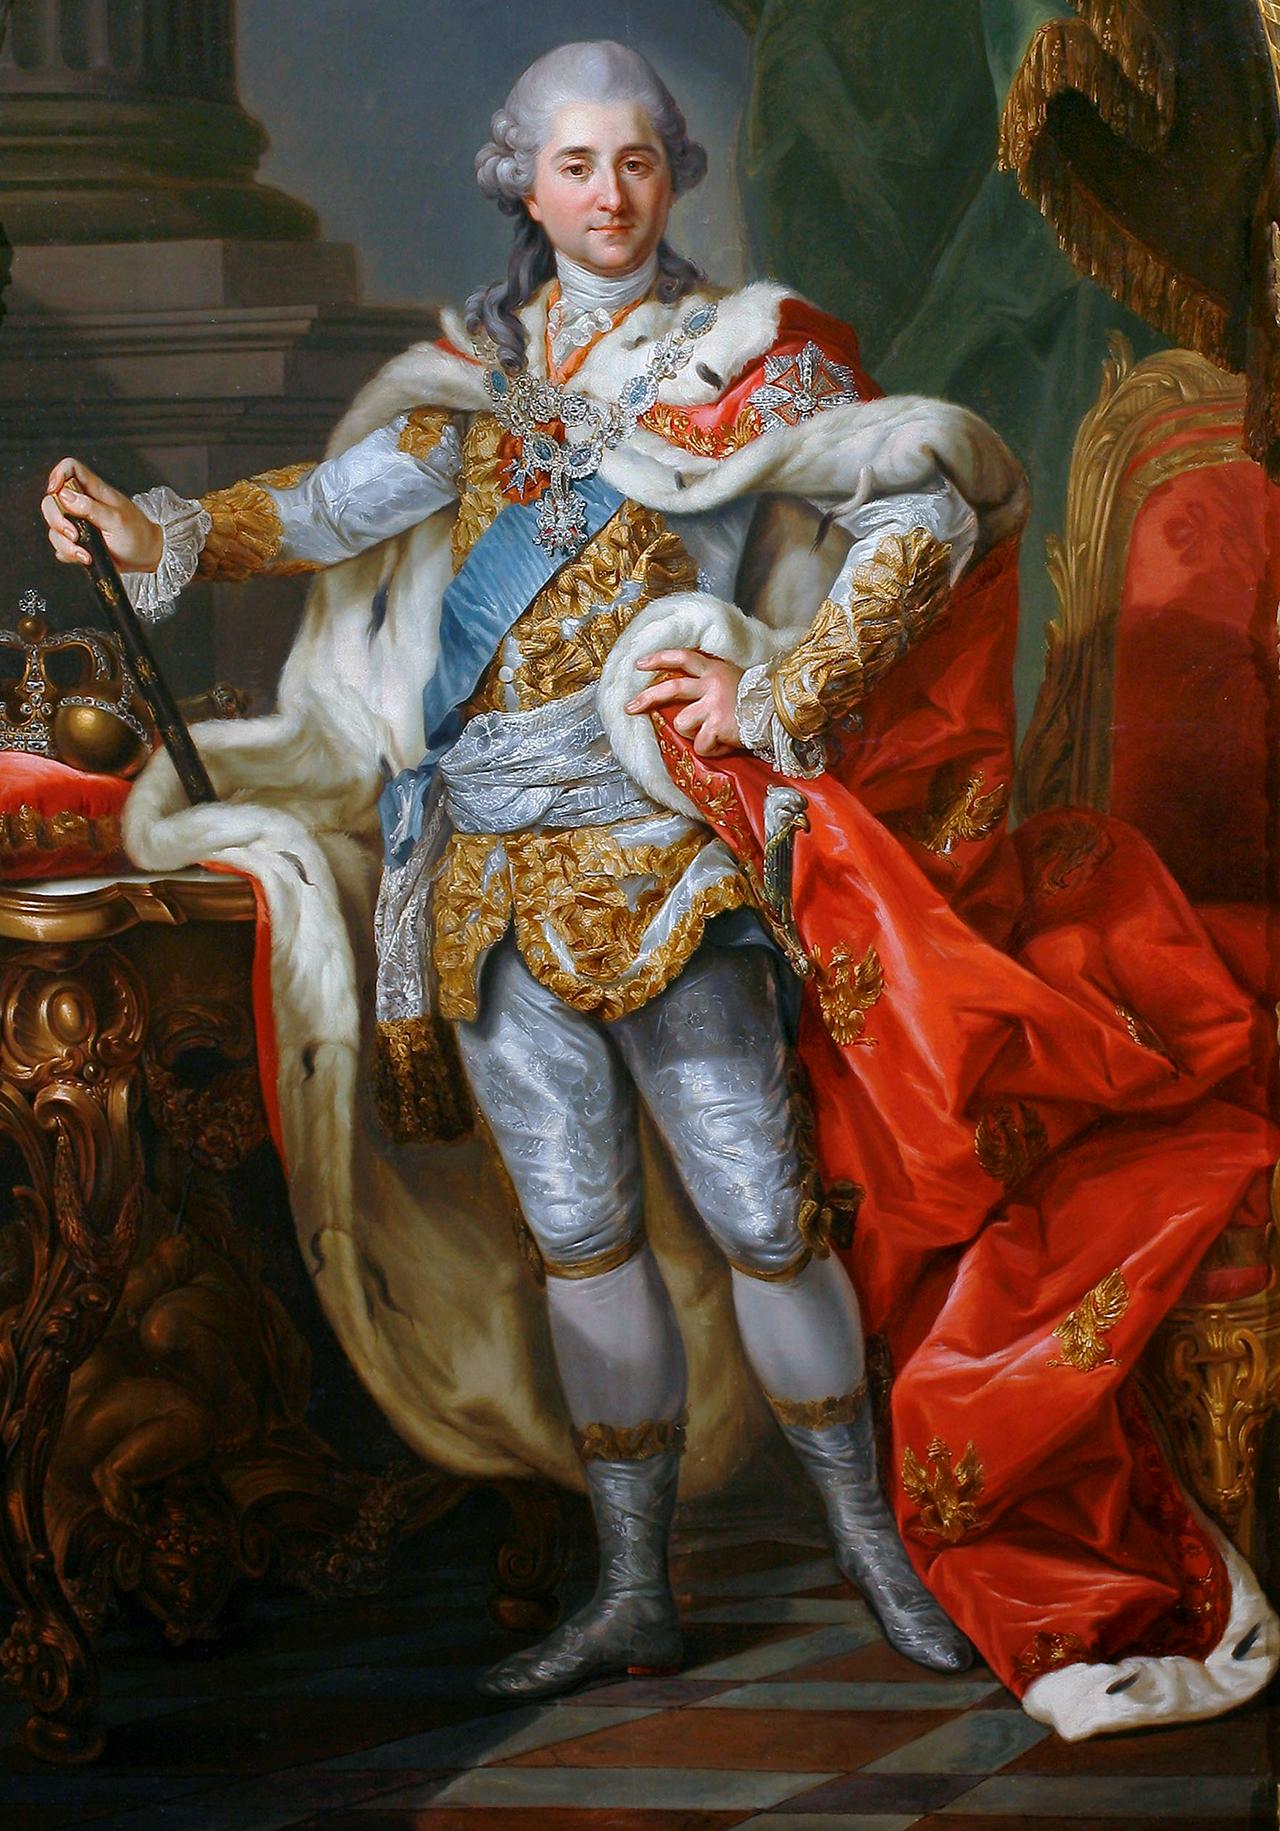 may Stanisław_II_August_Poniatowski_in_coronation_clothes